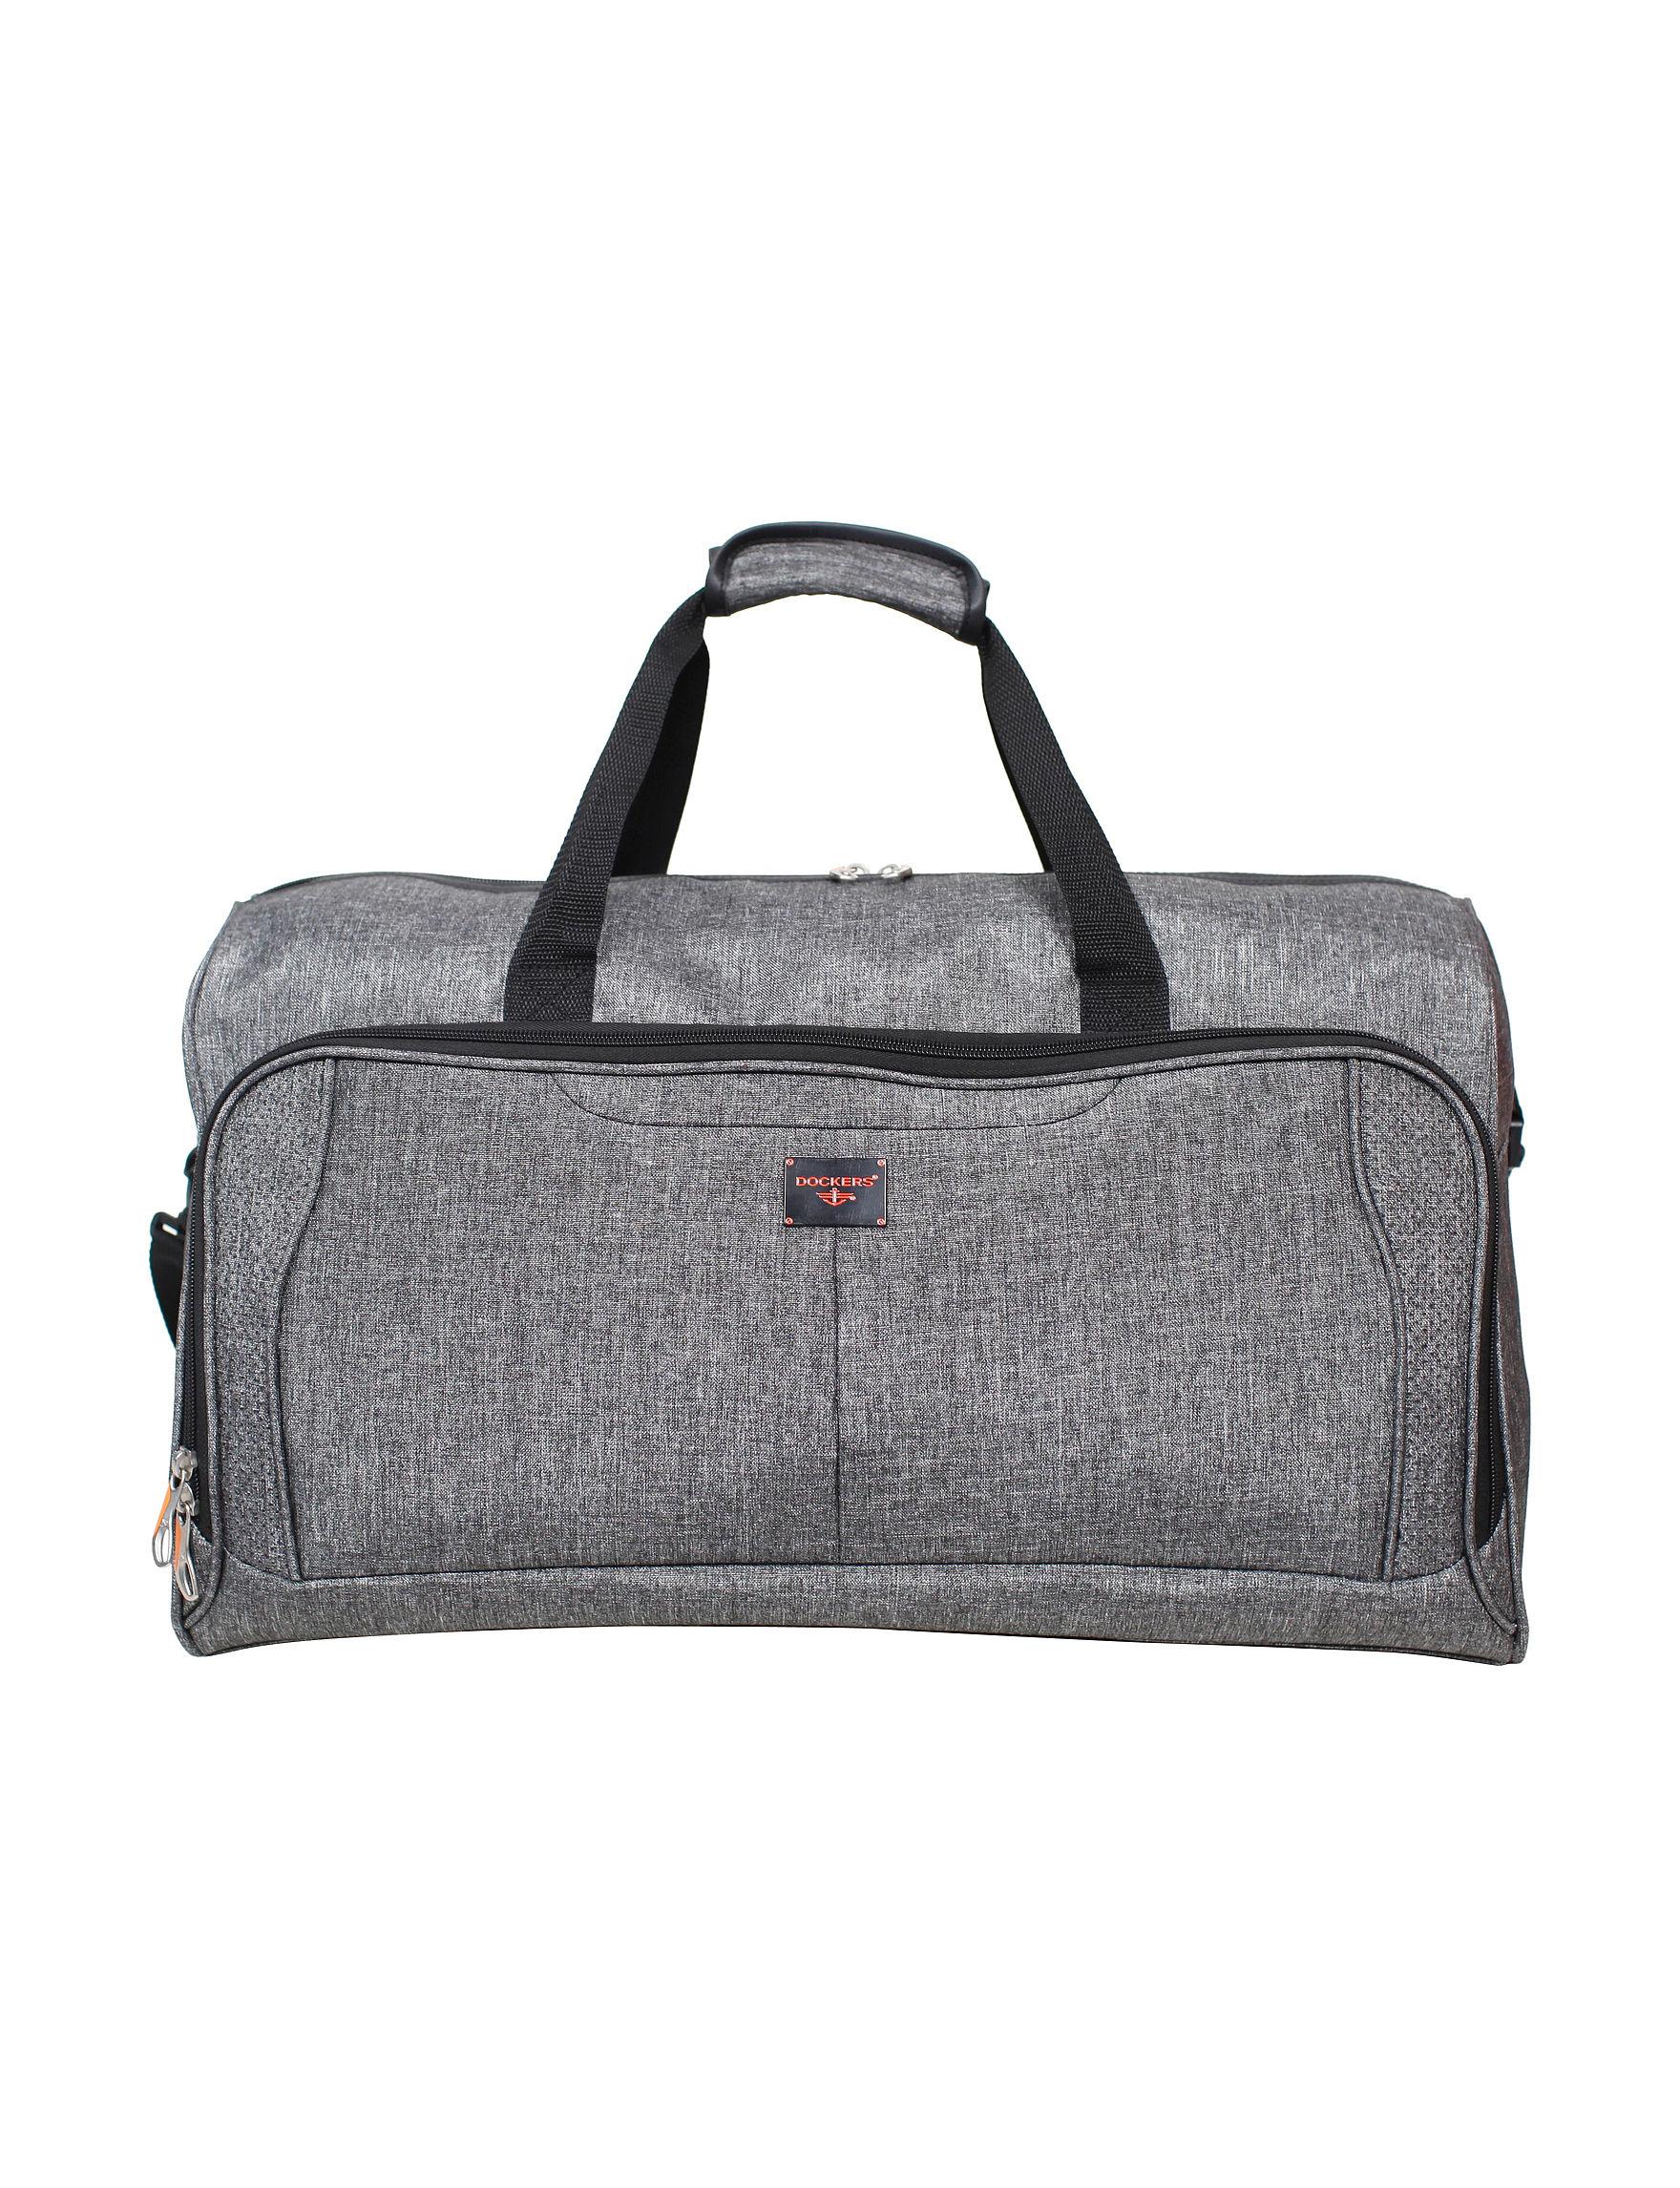 Dockers Charcoal Duffle Bags